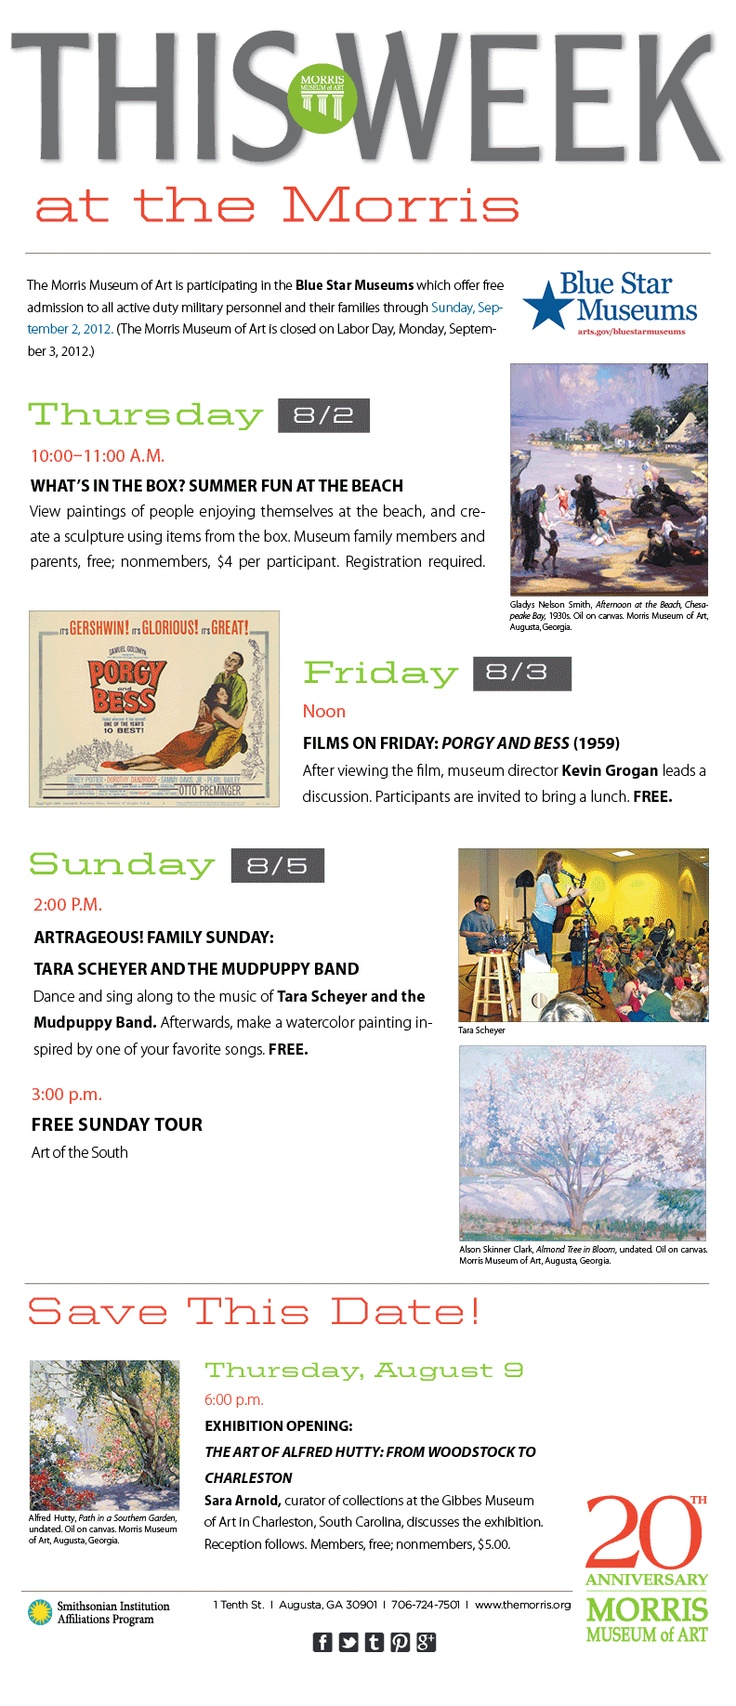 #Morris Museum of Art themorris.org: Arttastic, Museums, Art Themorris Org